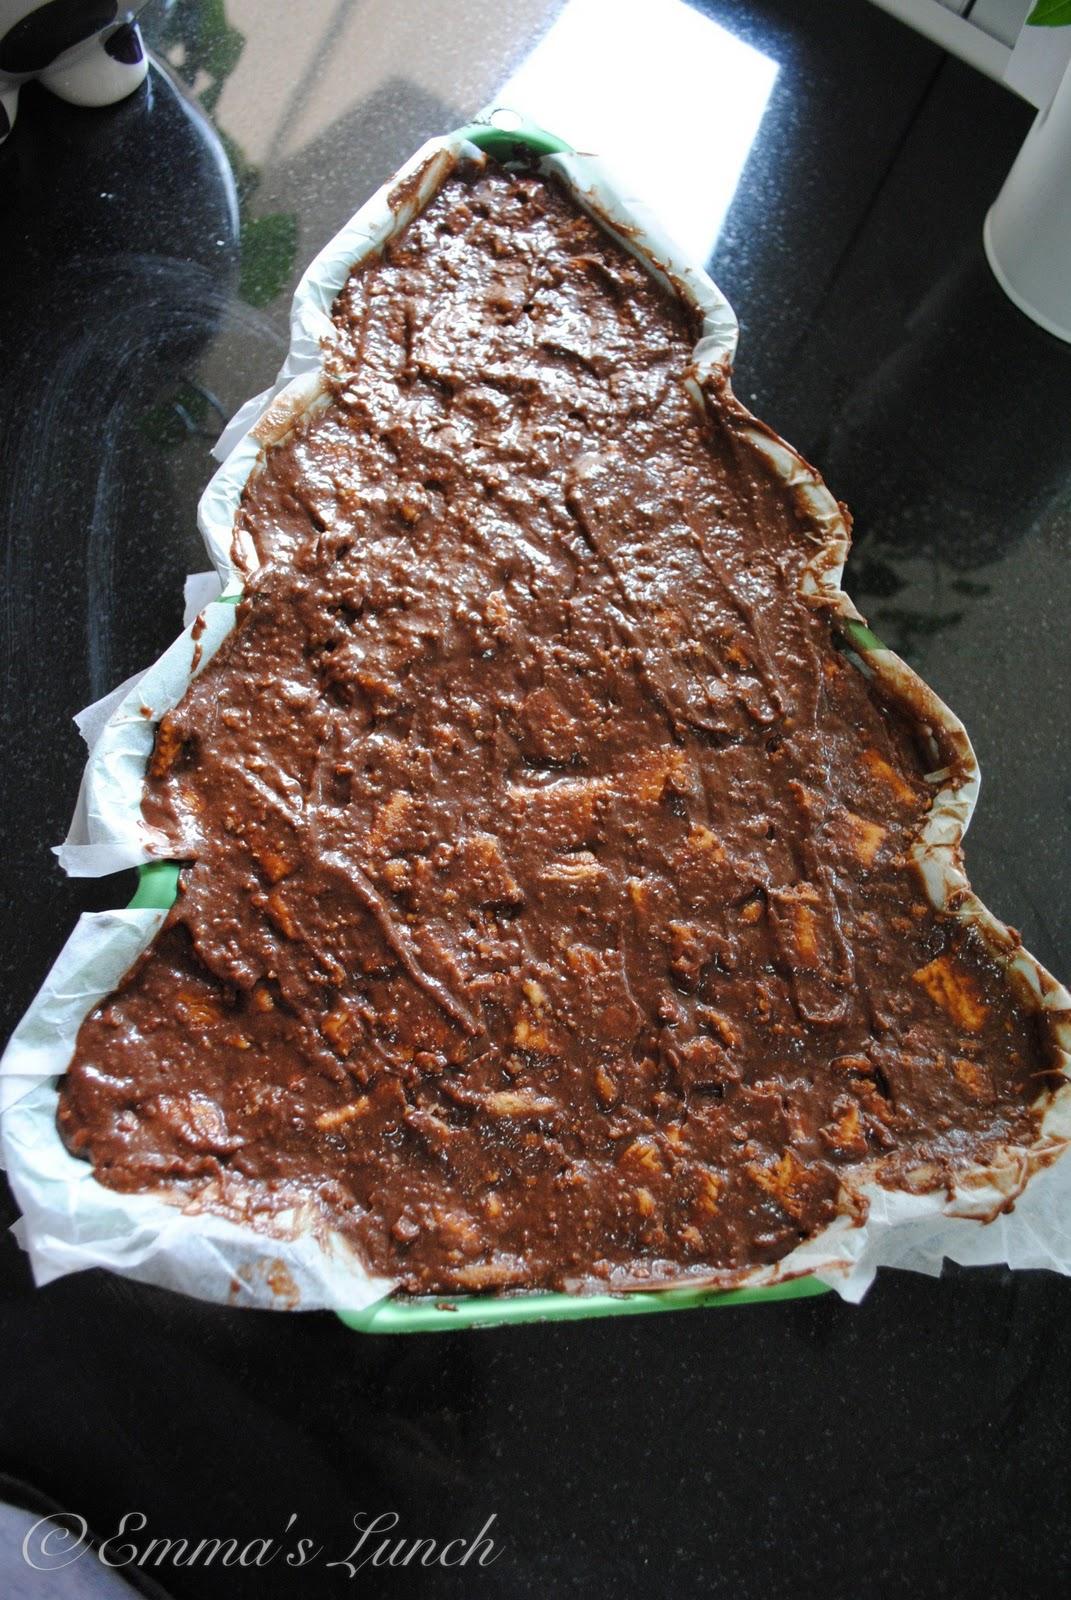 Chocolate Cake Procedure